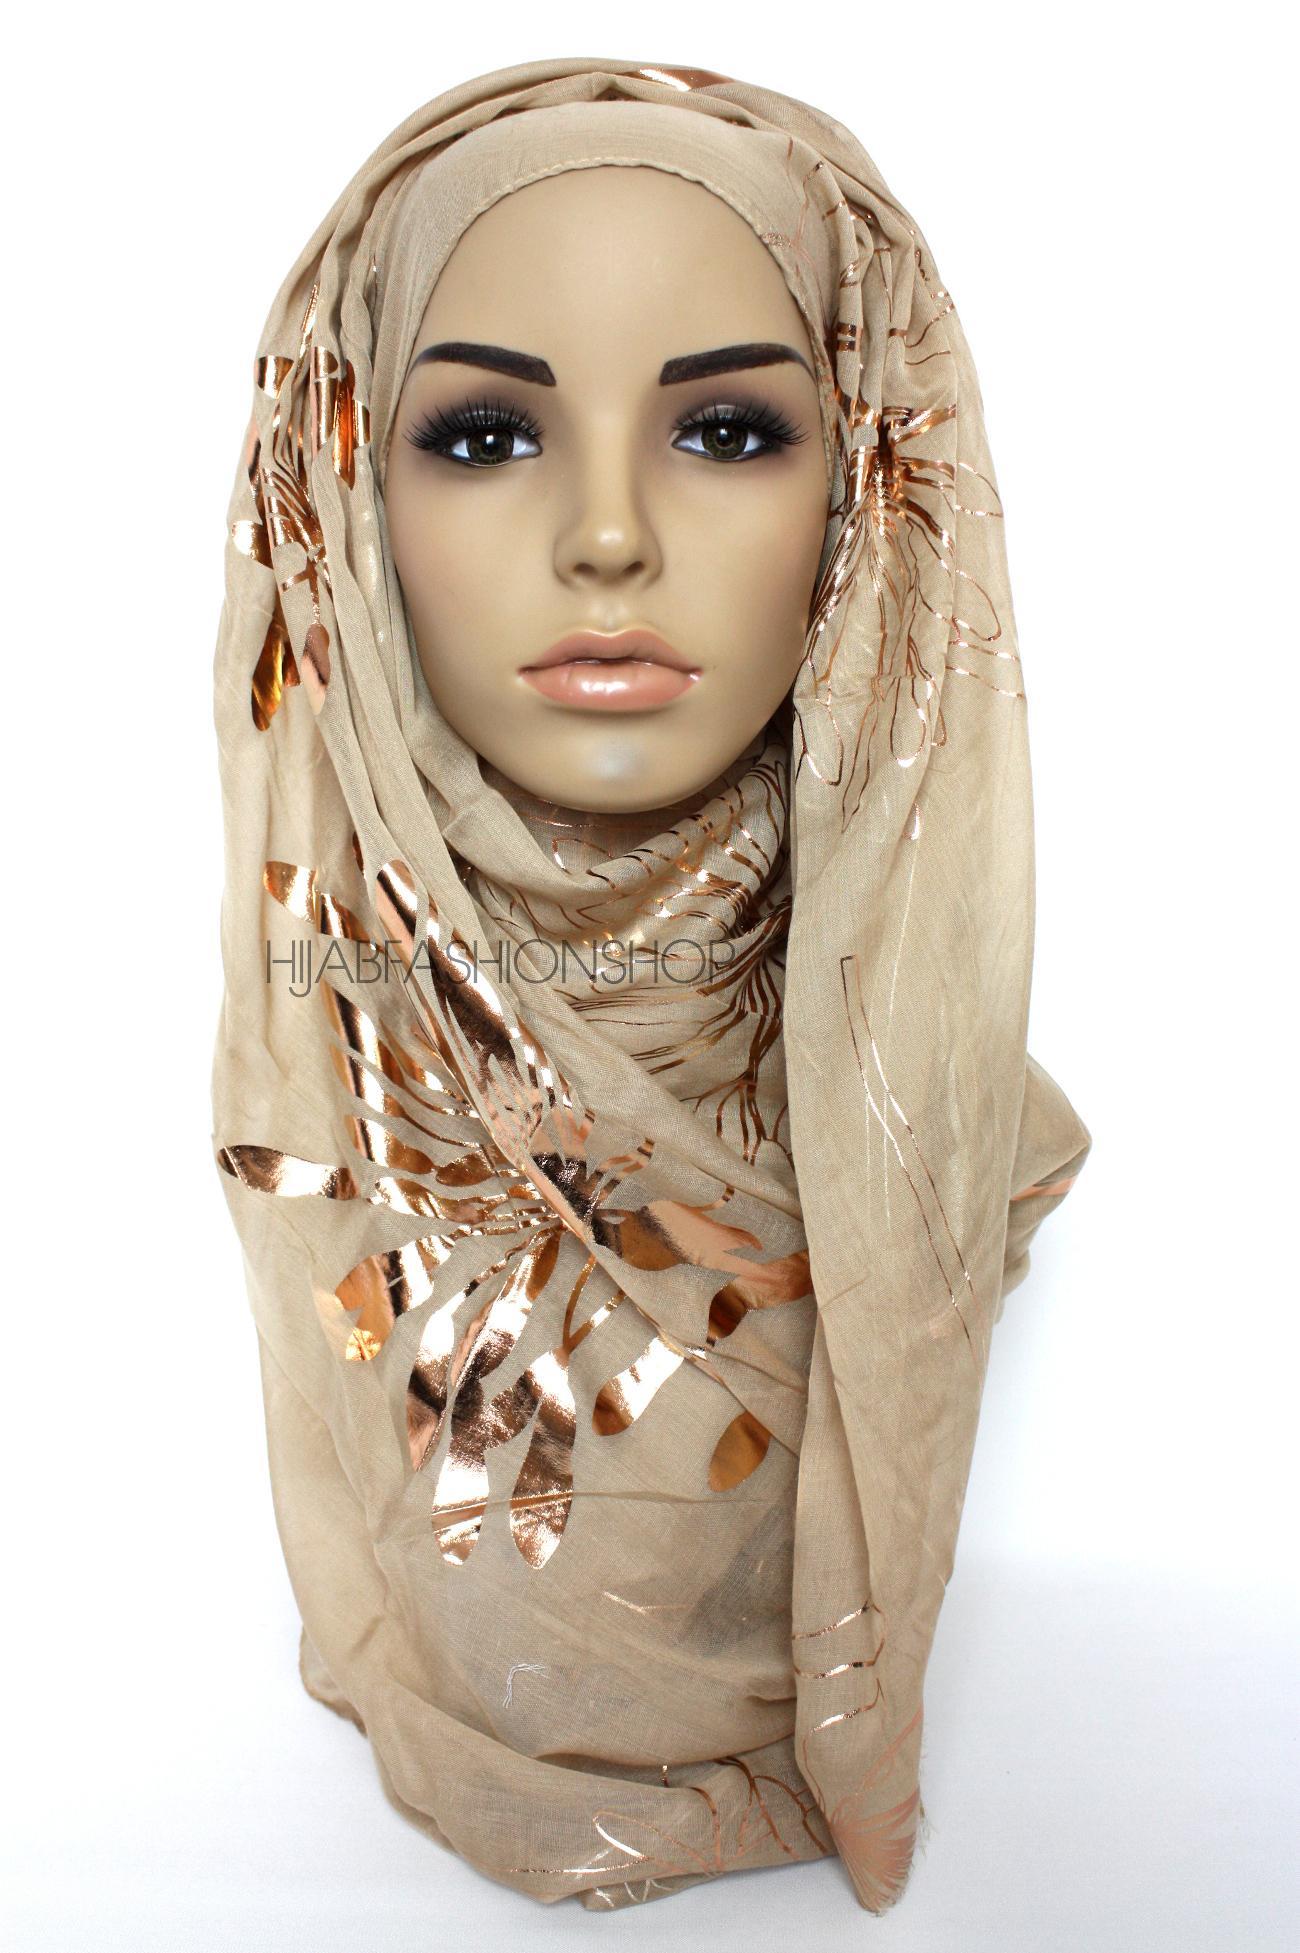 Peachy Nude Ribbed Jersey Hijab - Hijab Fashion Shop